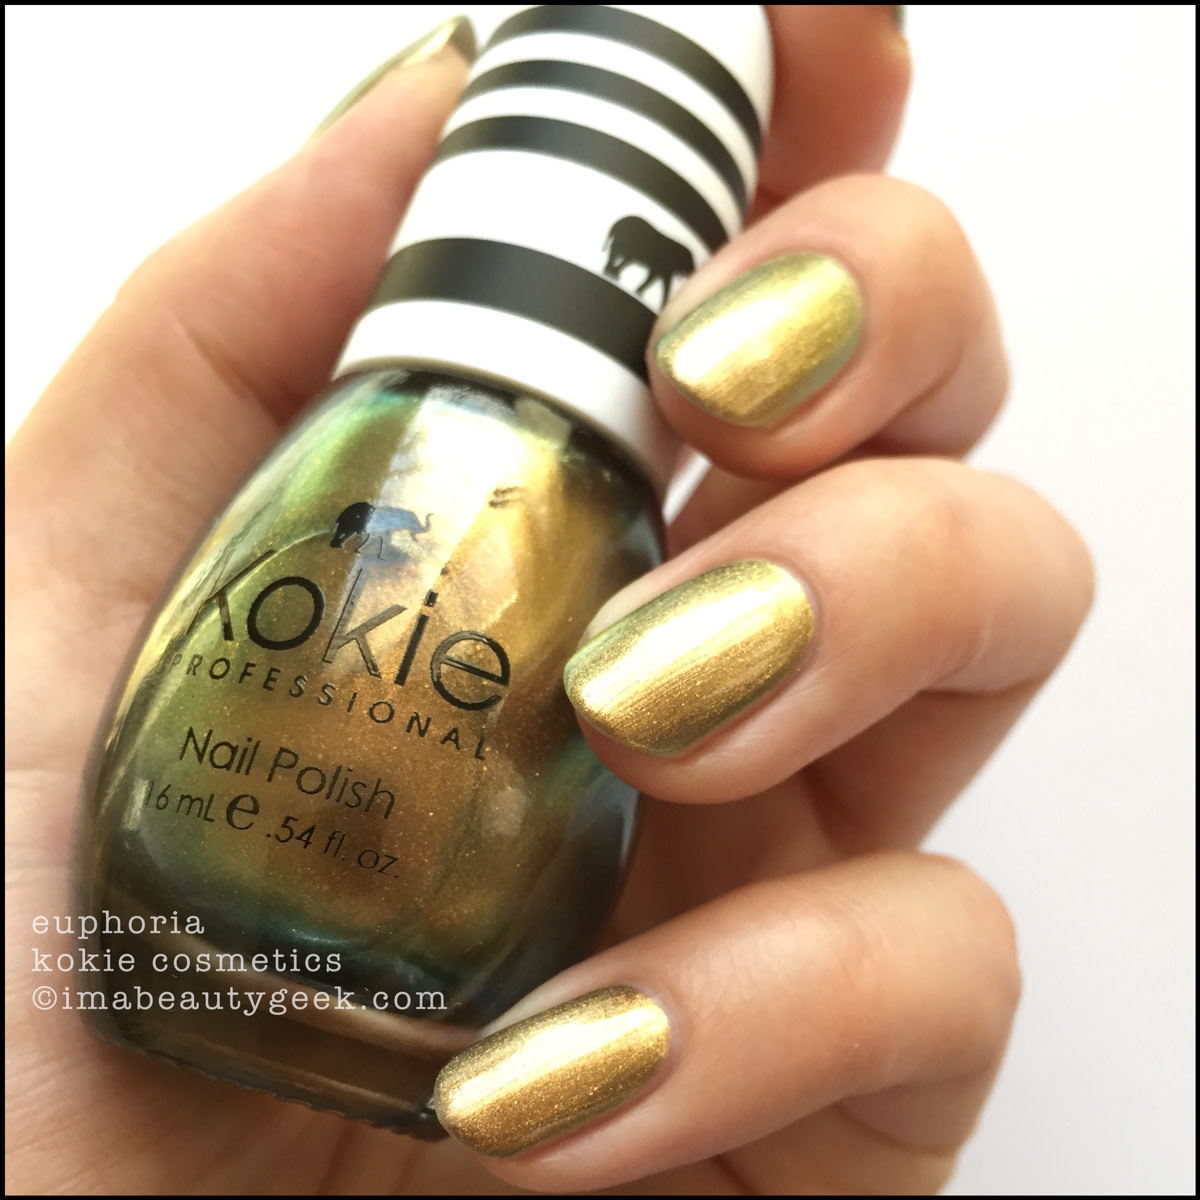 Kokie Euphoria Nail Polish_Kokie Cosmetics Nail Polish Swatches 2016